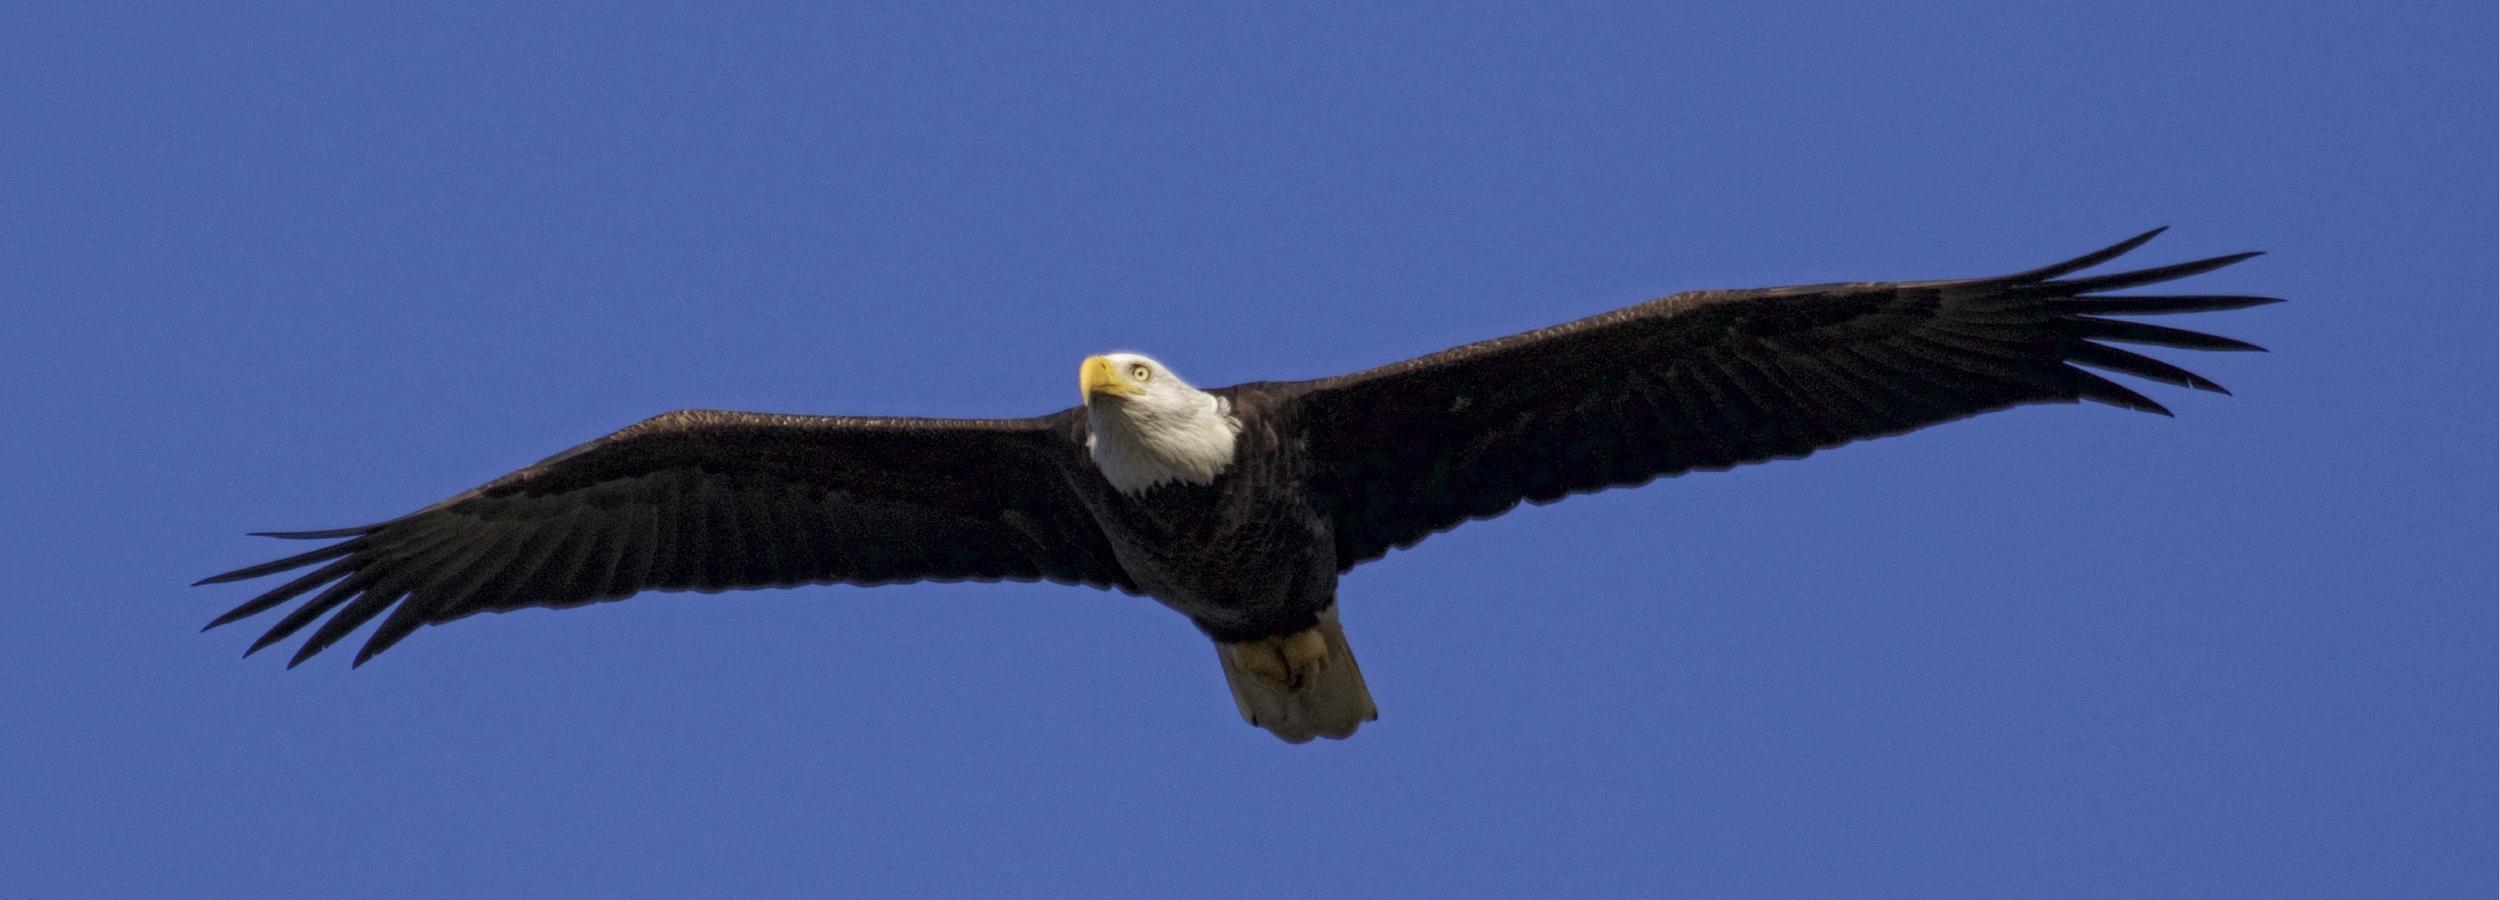 I'm good. Soaring like an Eagle..good bye blues!